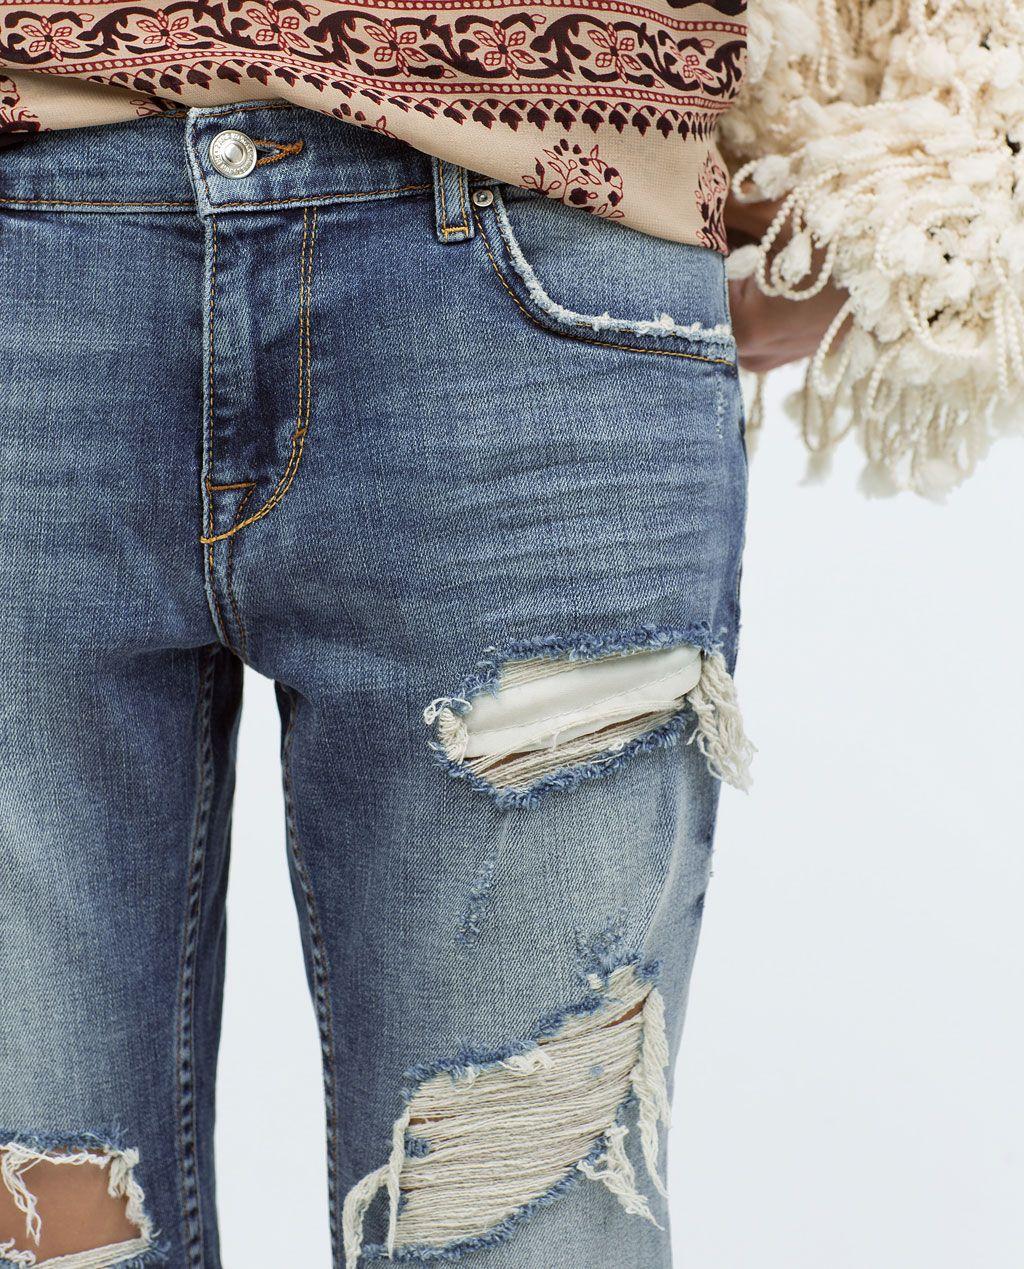 5a3591c8bb82 ZARA - WOMAN - VINTAGE WASH RIPPED CIGARETTE JEANS   Fashion Passion ...